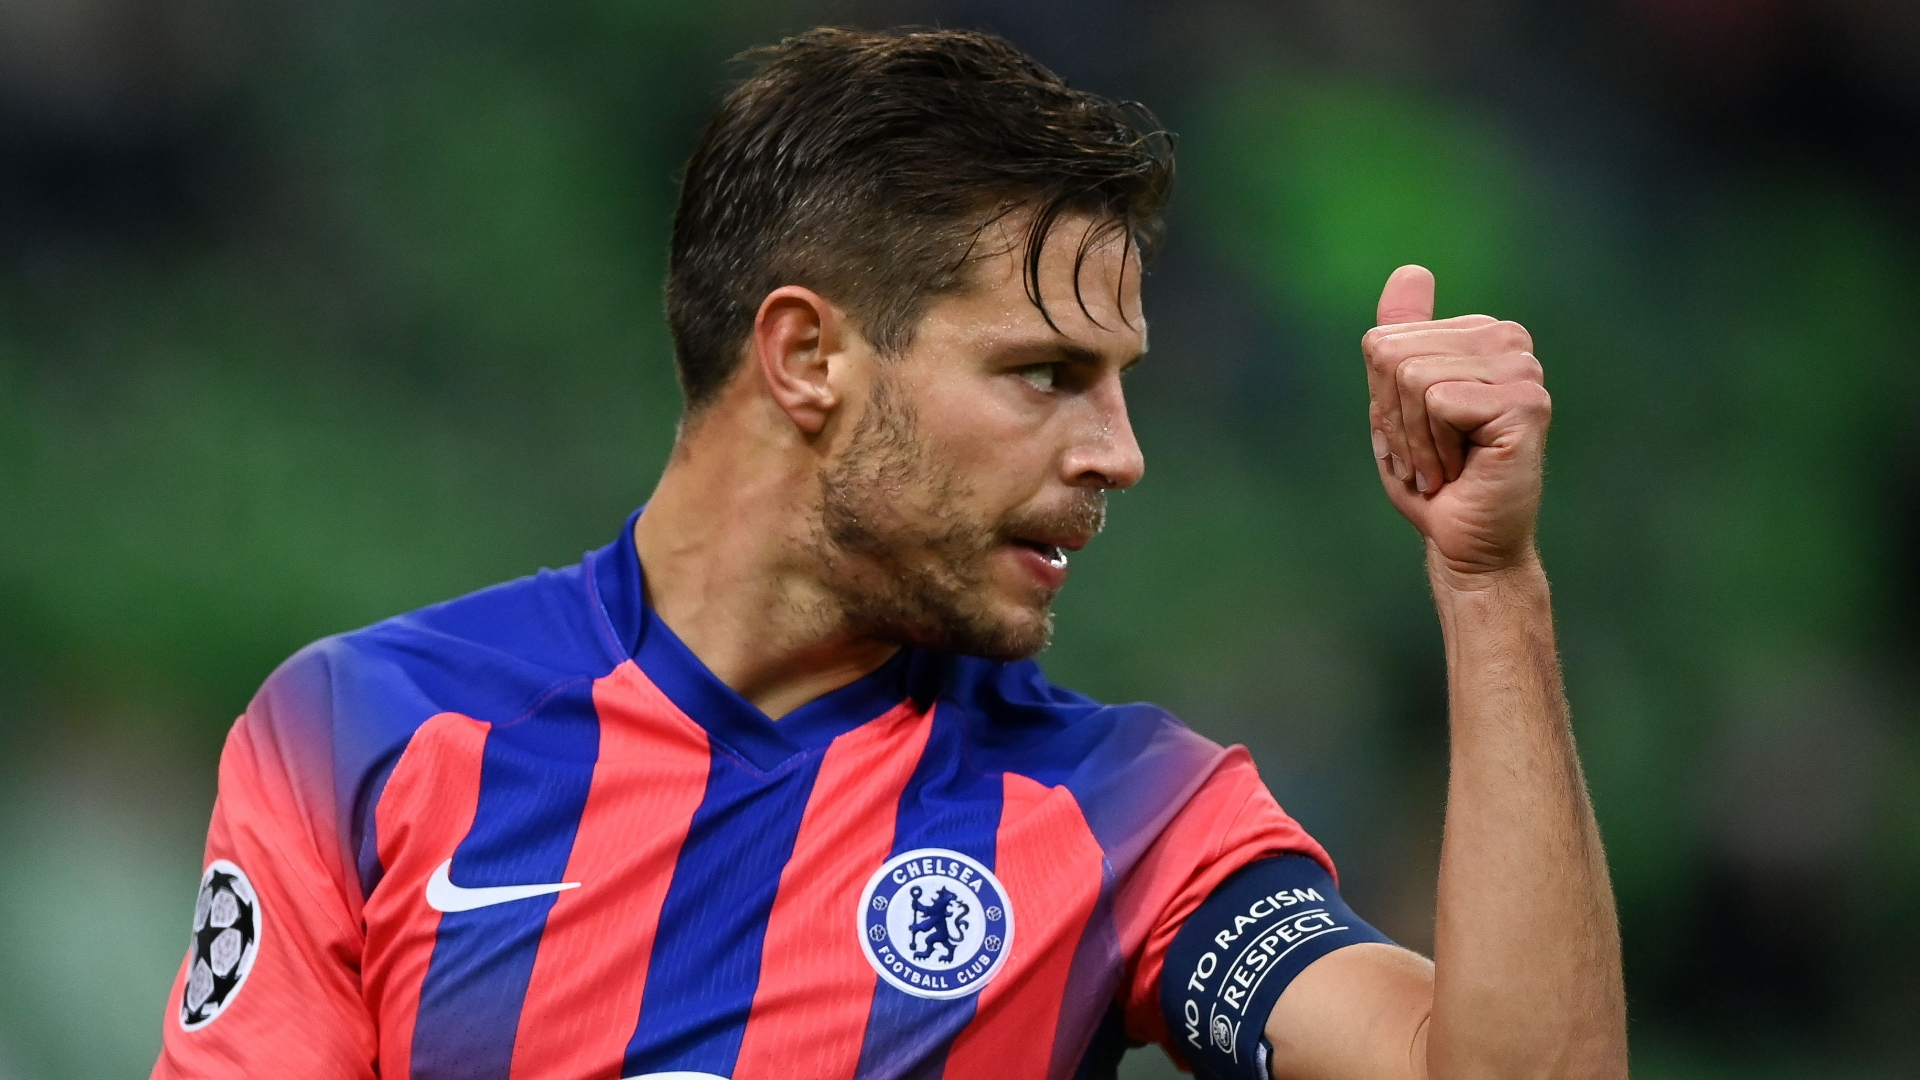 Chelsea set 'biggest trophy' target by Azpilicueta as long-serving skipper eyes Champions League glory